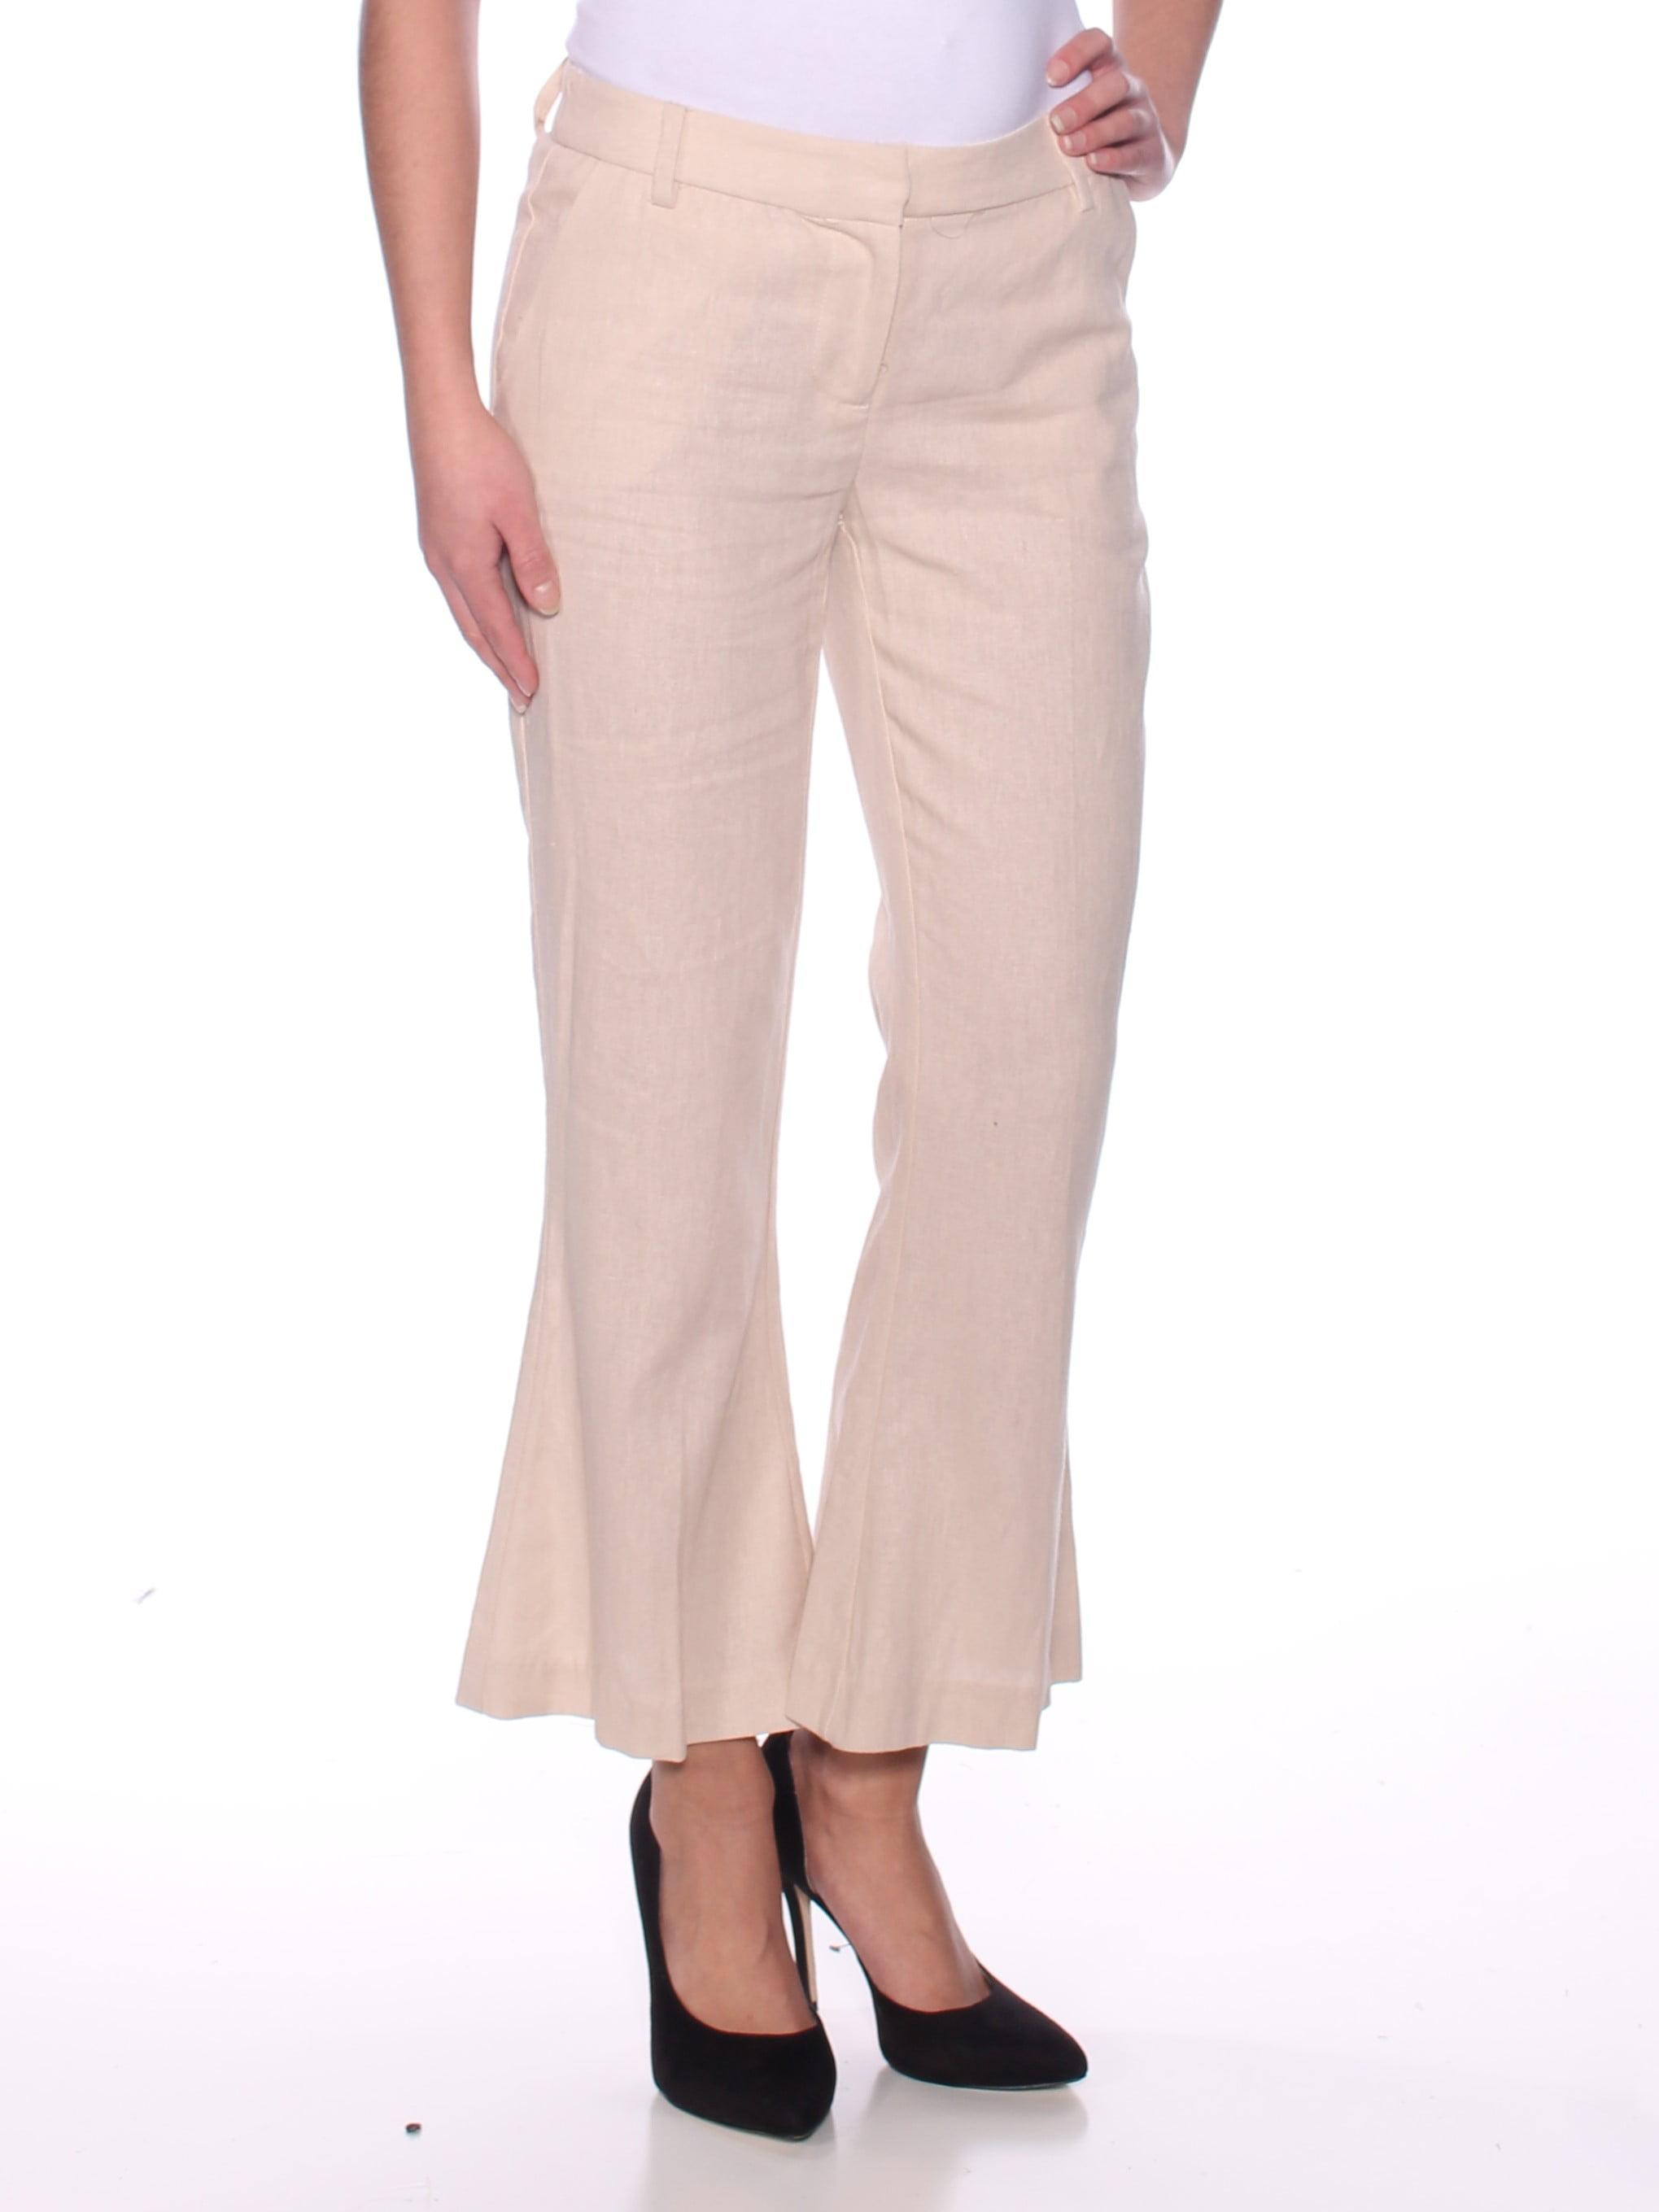 XOXO Womens Beige Flare Pants Juniors  Size: 3